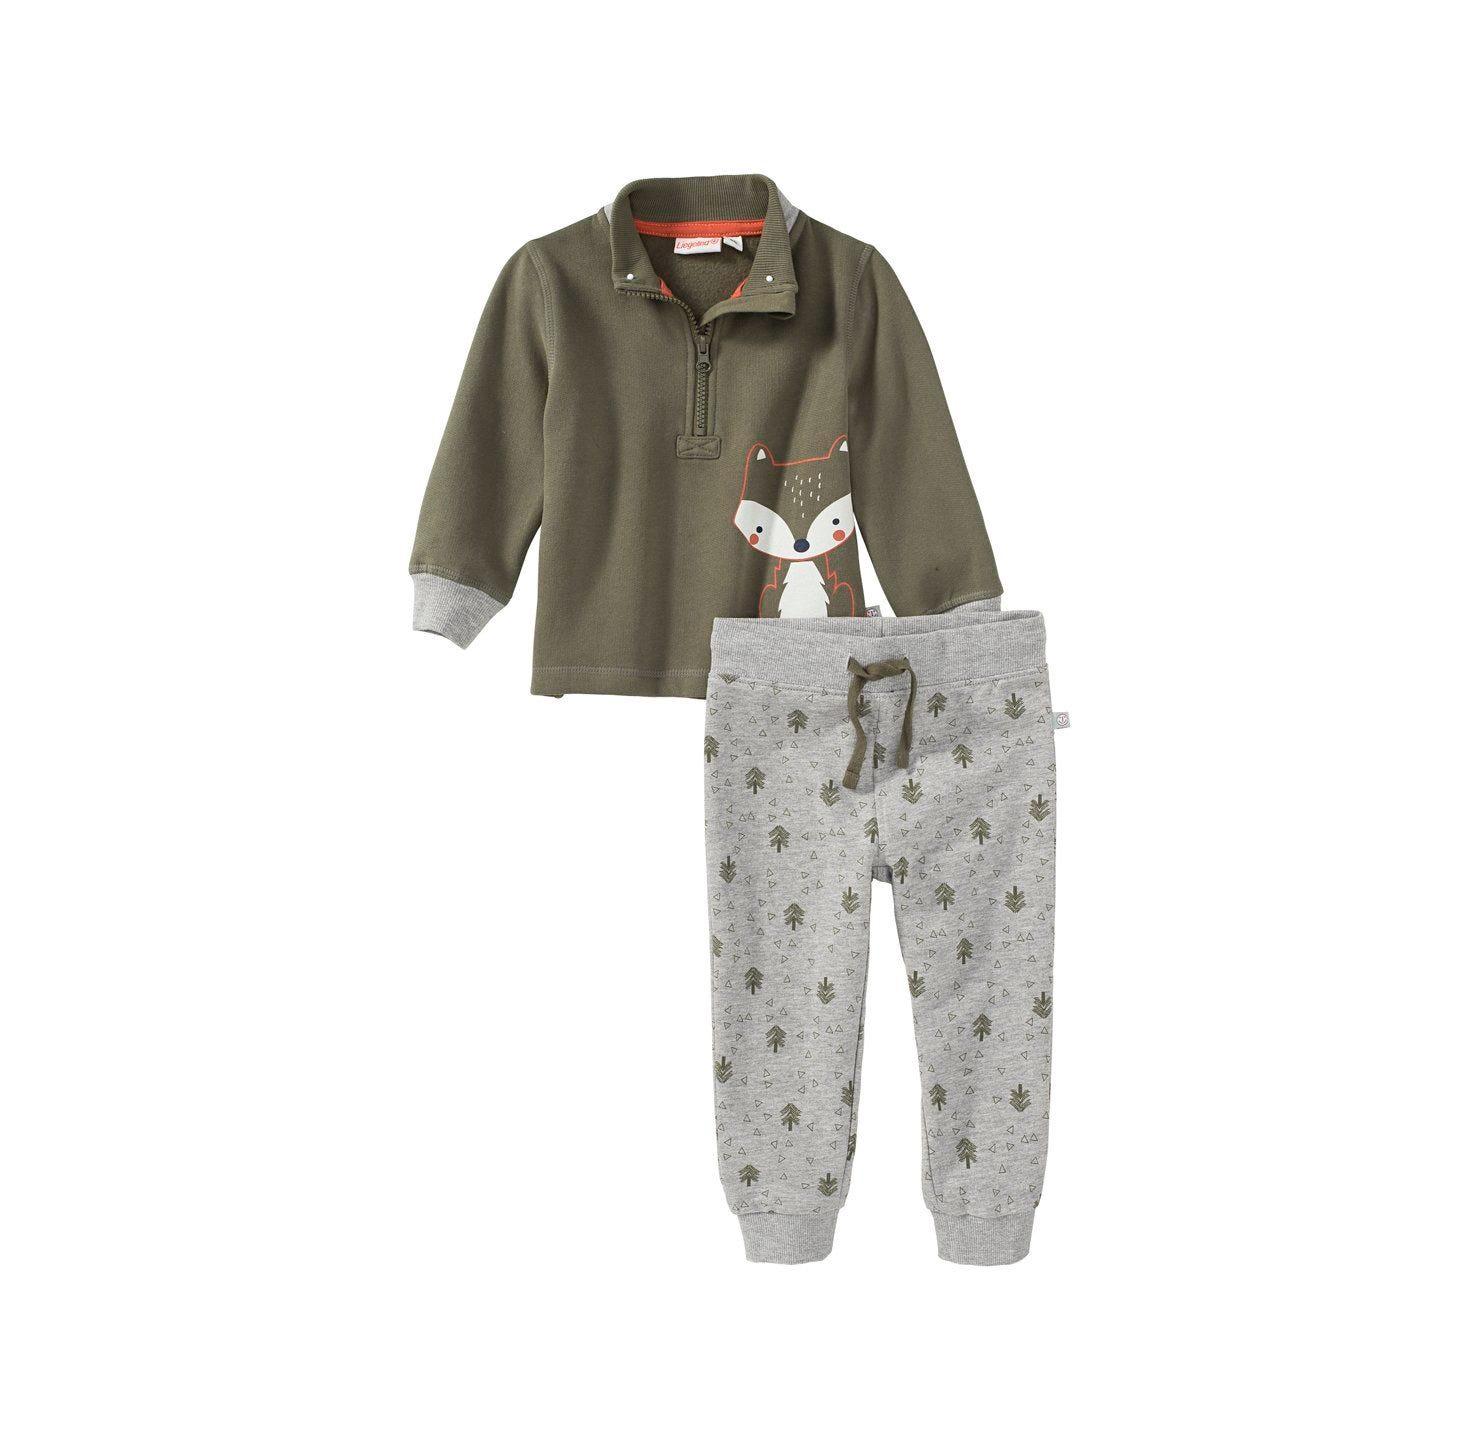 wholesale dealer b9fef 8a6f2 Jungen Babymode ⇒ günstige Babybekleidung kaufen | NKD | NKD